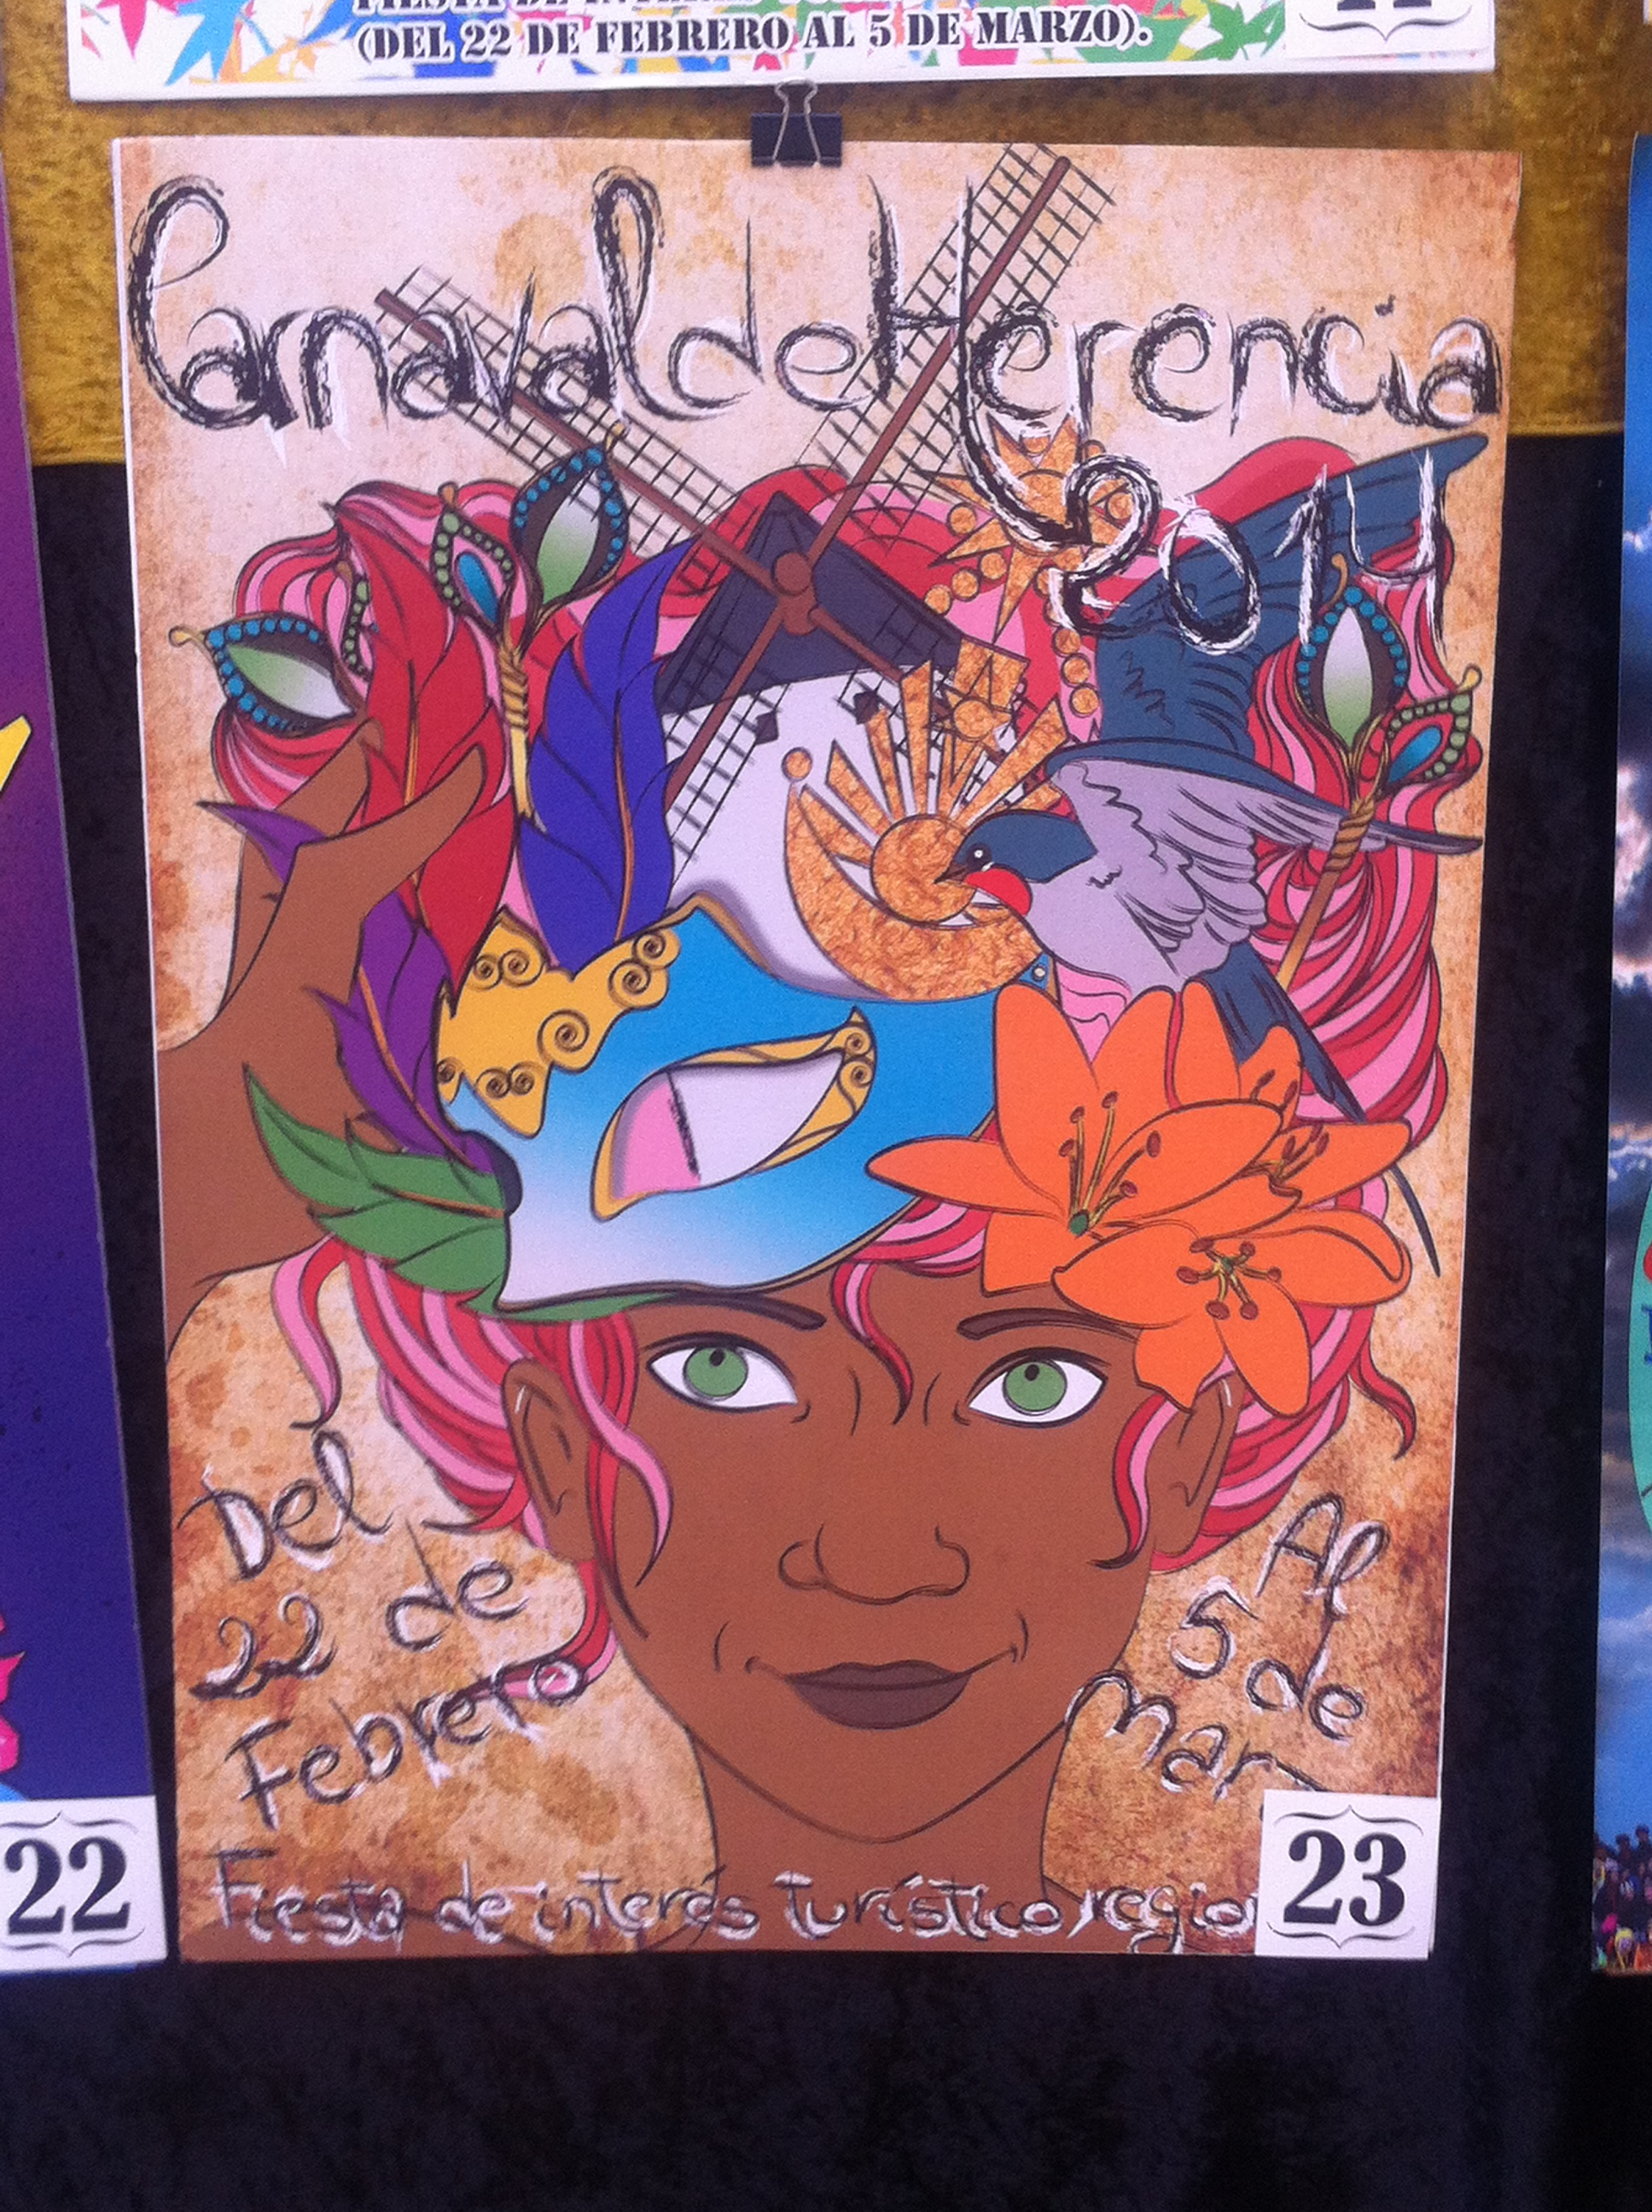 Concurso Carteles Carnaval 2014 (23)